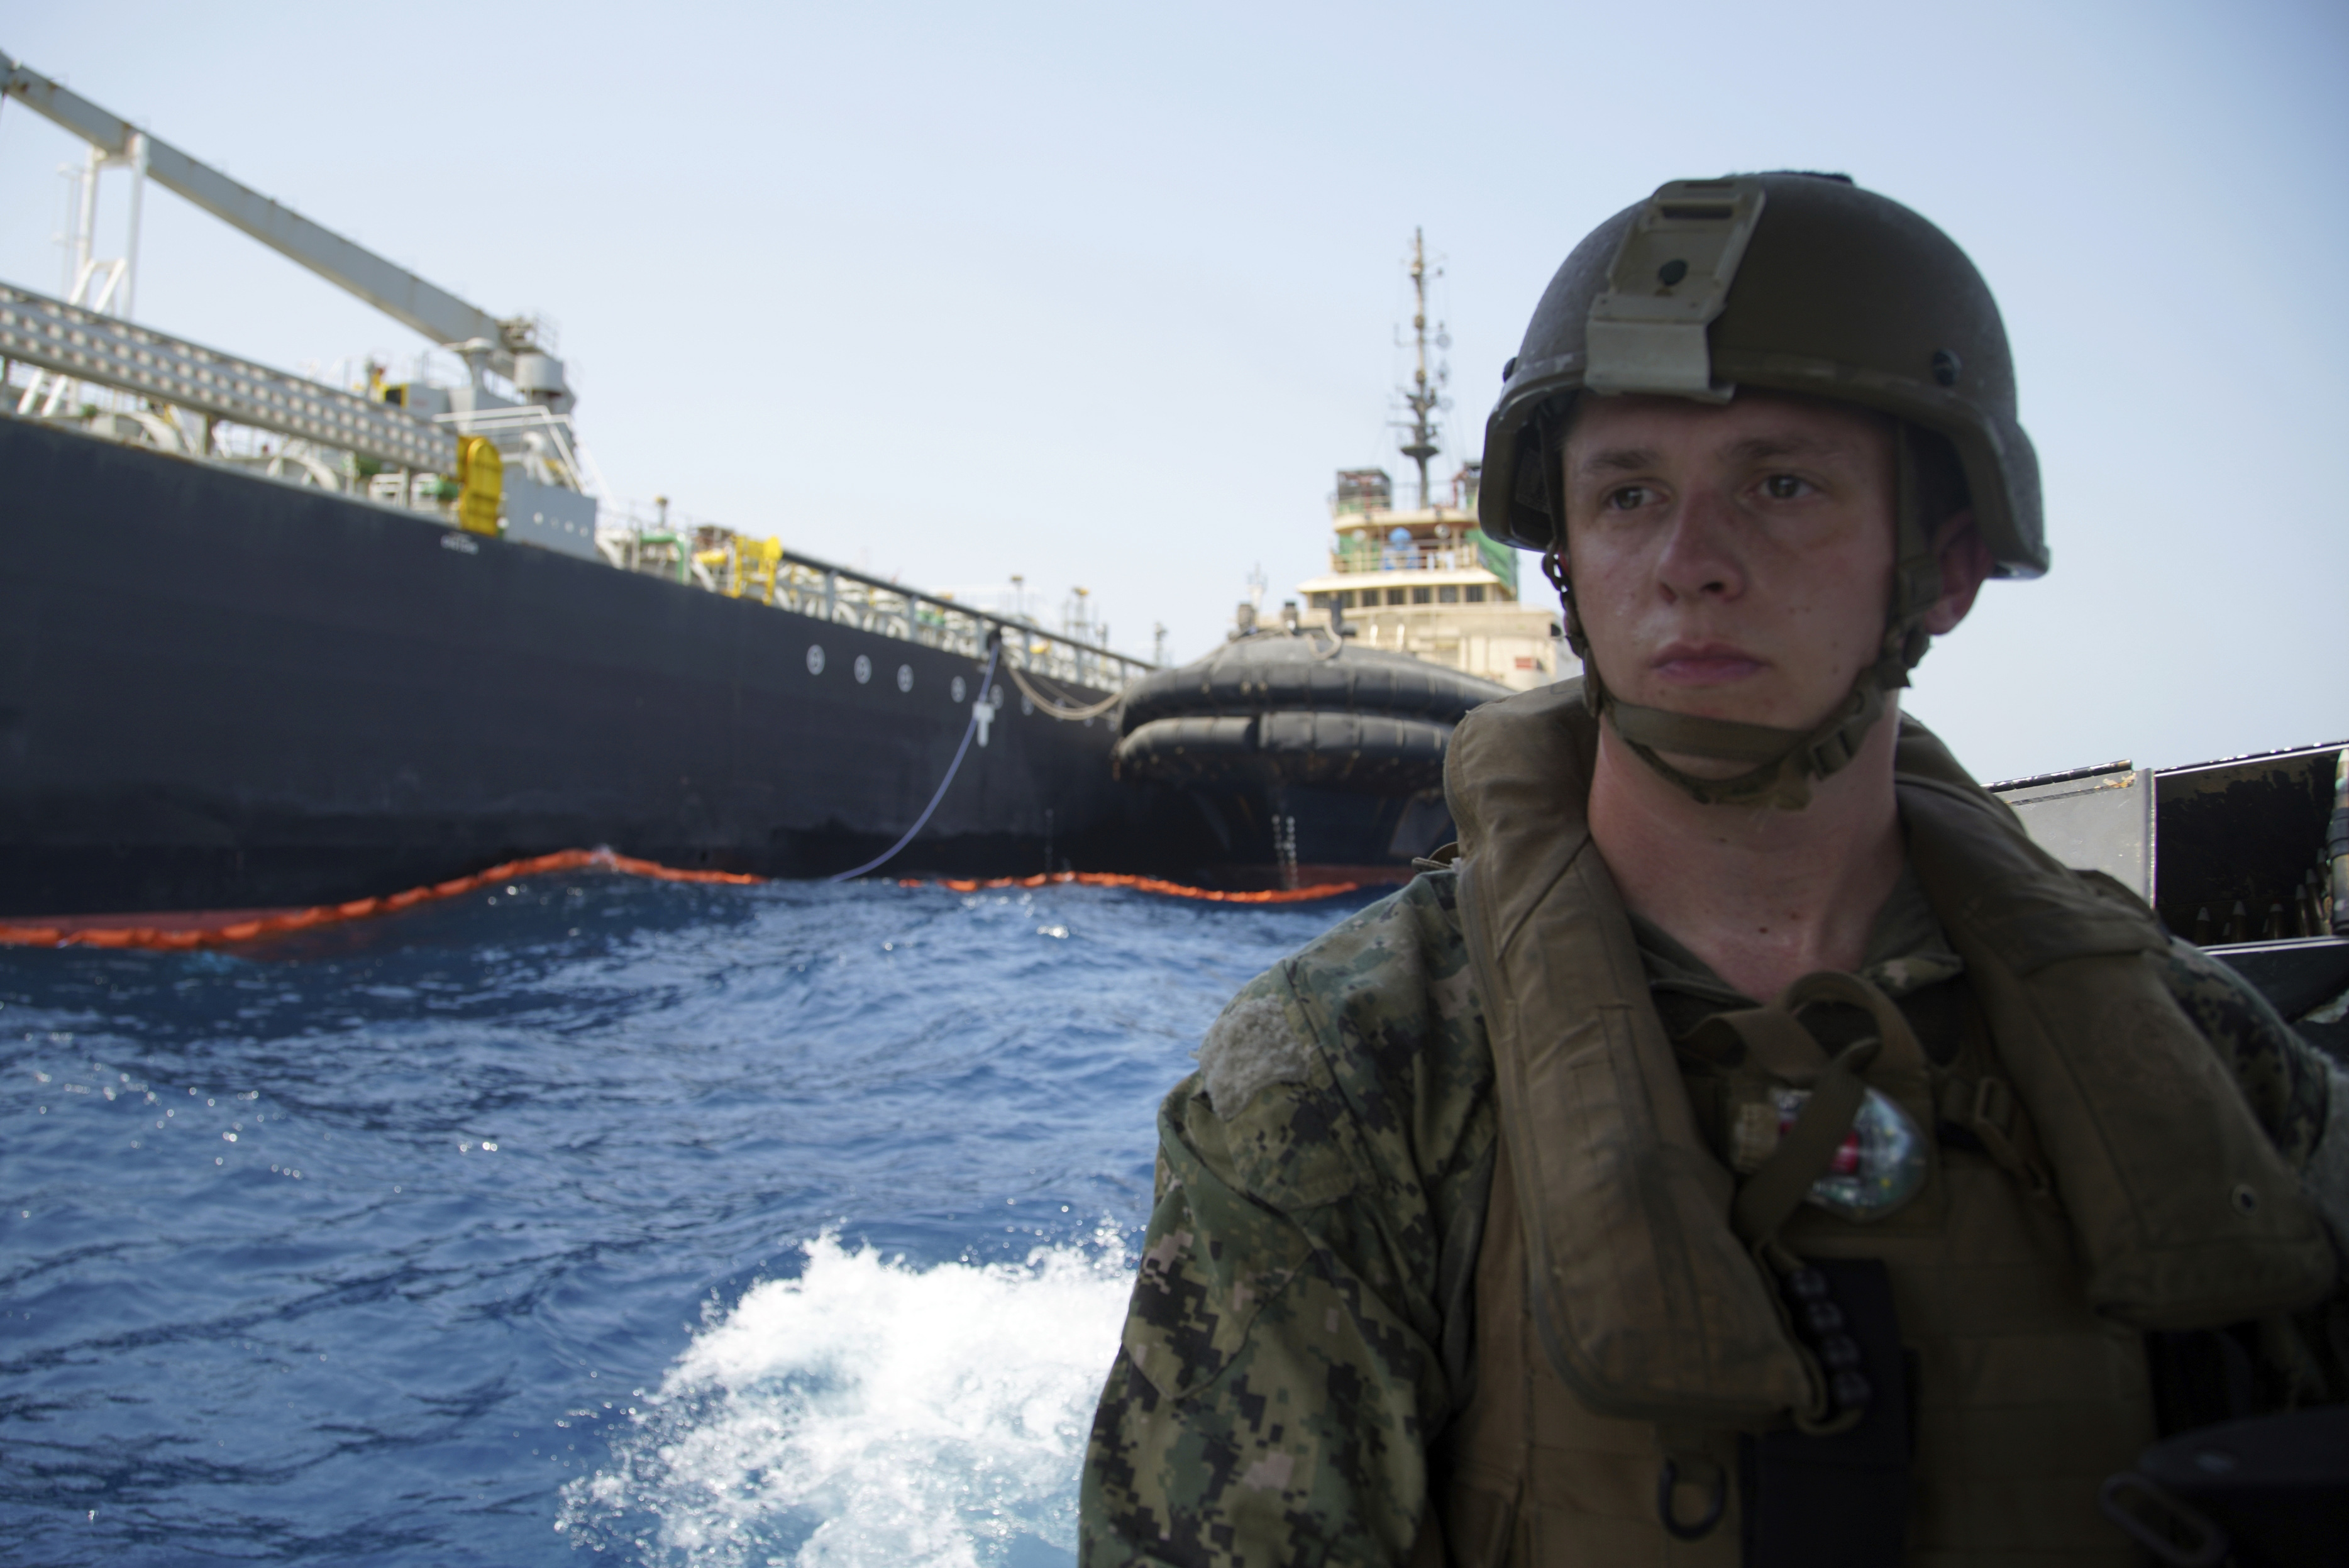 AP Explains: Mideast tensions threaten key global oil route